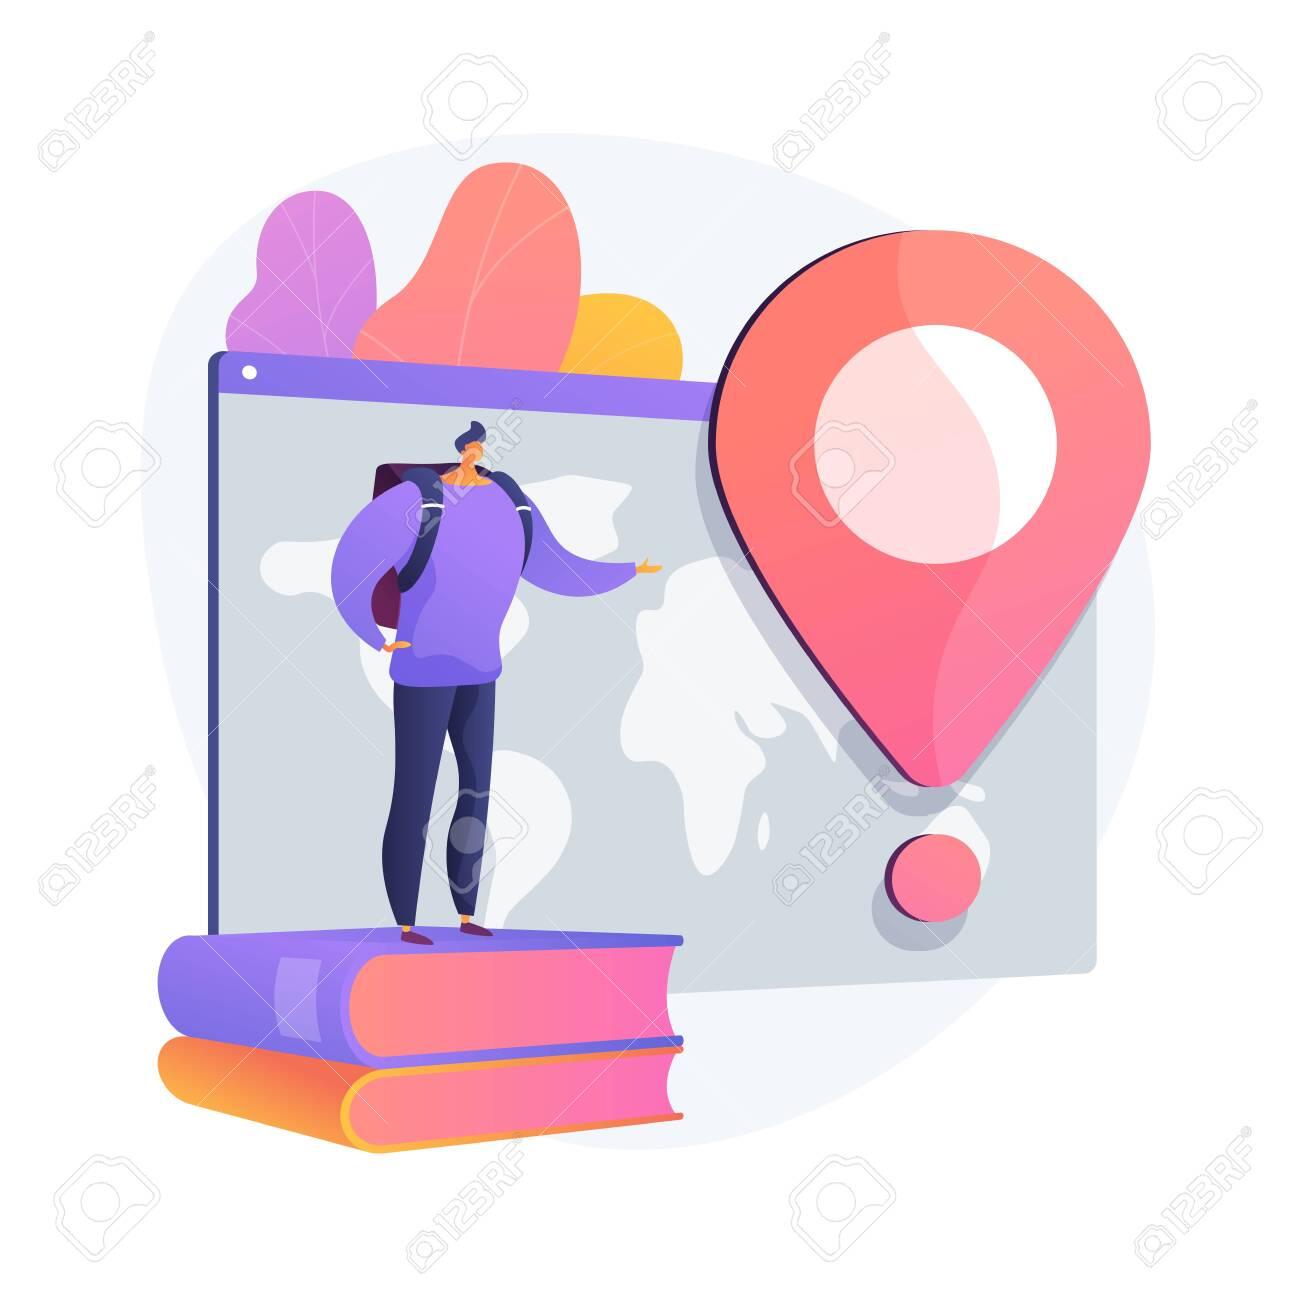 International tourism vector concept metaphor - 139004233